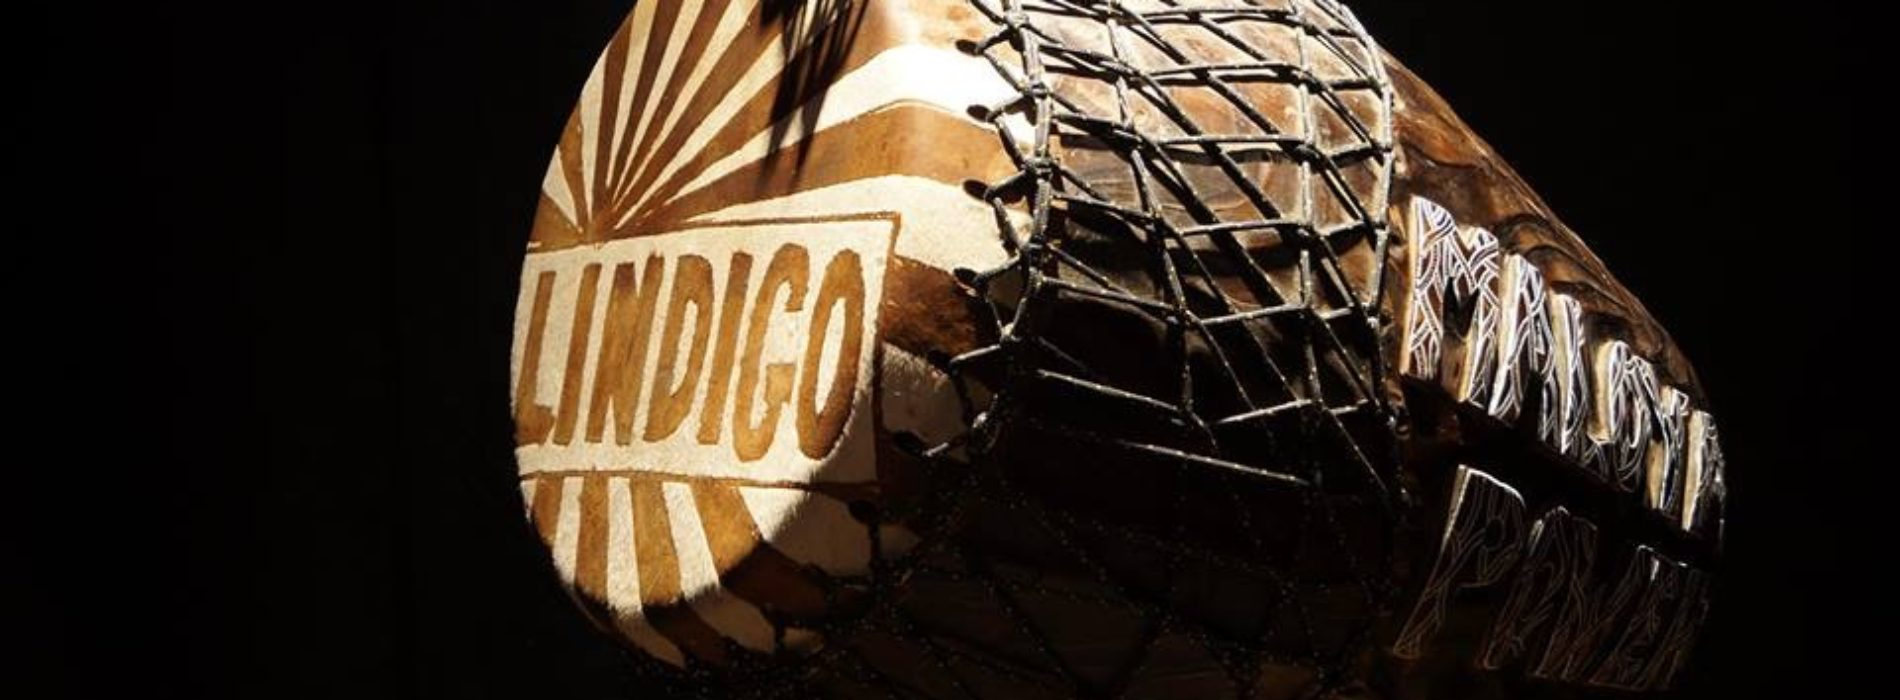 Découvre le nouvel album du groupe LINDIGO – KOMSA GAYAR – Mars 2018 – MALOYA